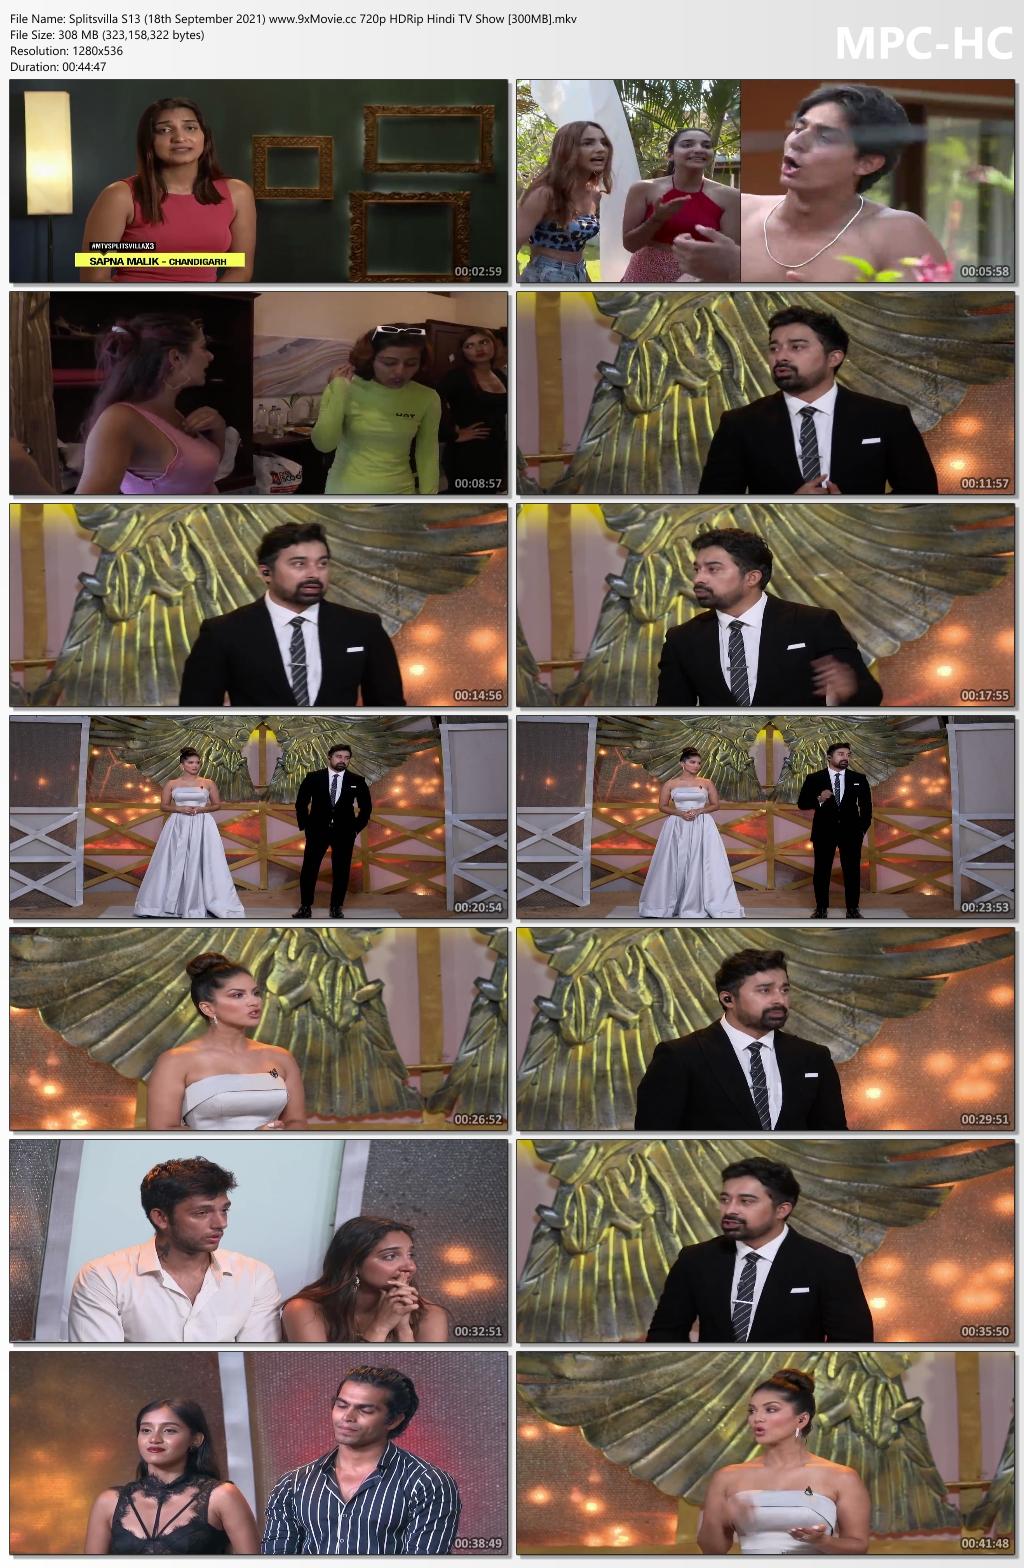 Splitsvilla-S13-18th-September-2021-www-9x-Movie-cc-720p-HDRip-Hindi-TV-Show-300-MB-mkv